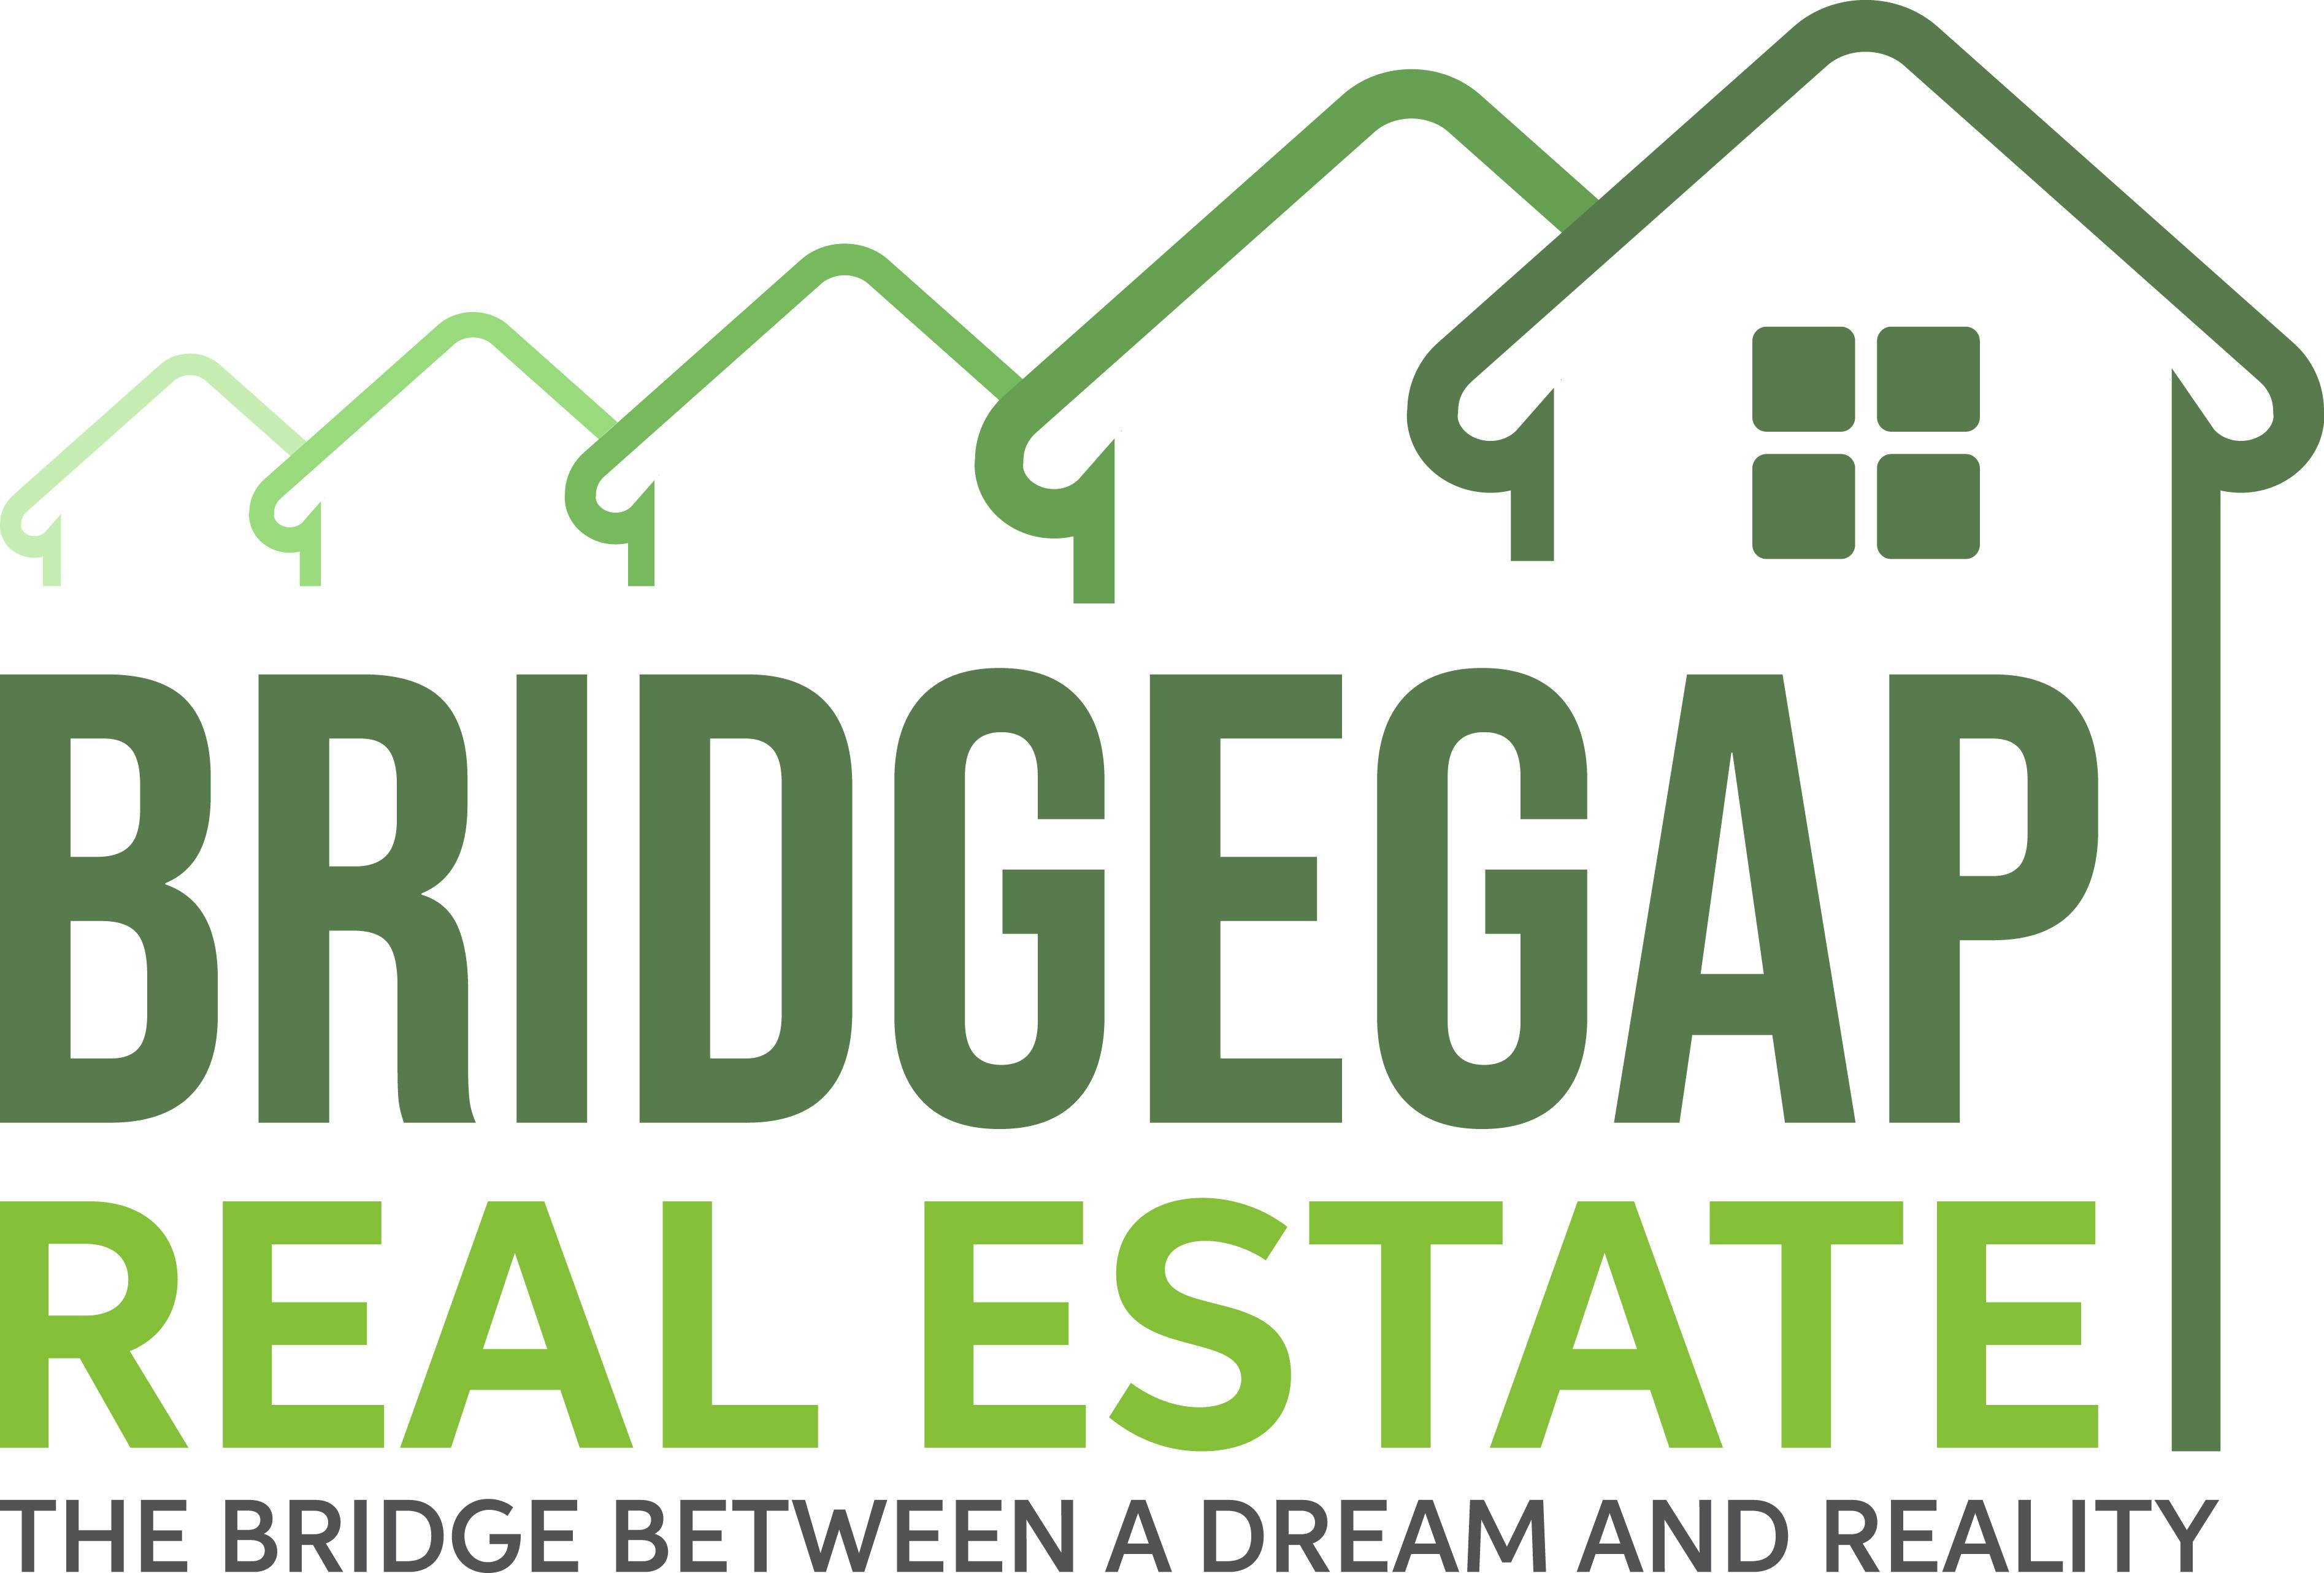 Bridgegap Real Estate